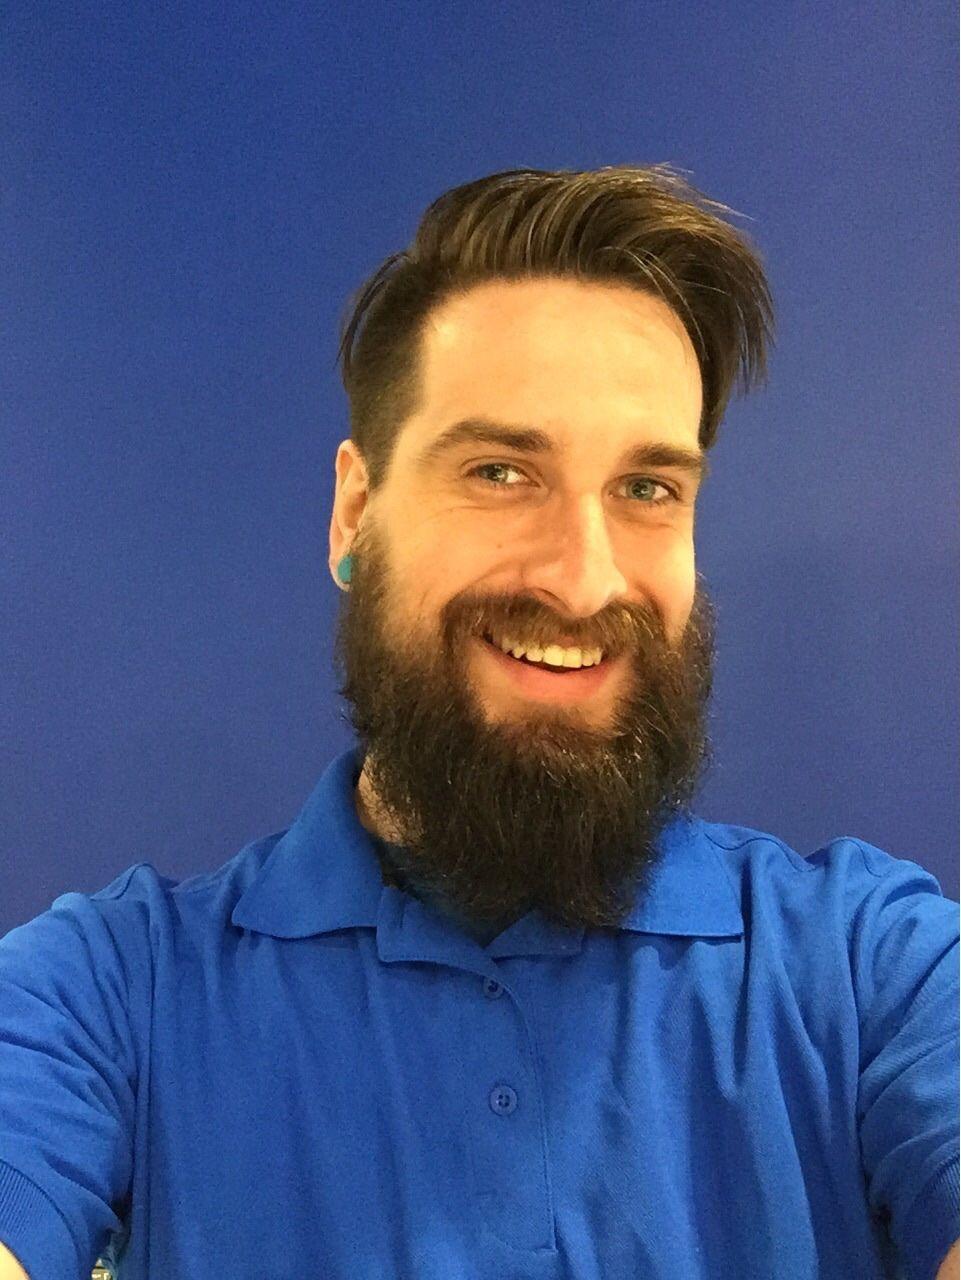 Men haircuts names bigbadbeards u bearditorium zak  beards  pinterest